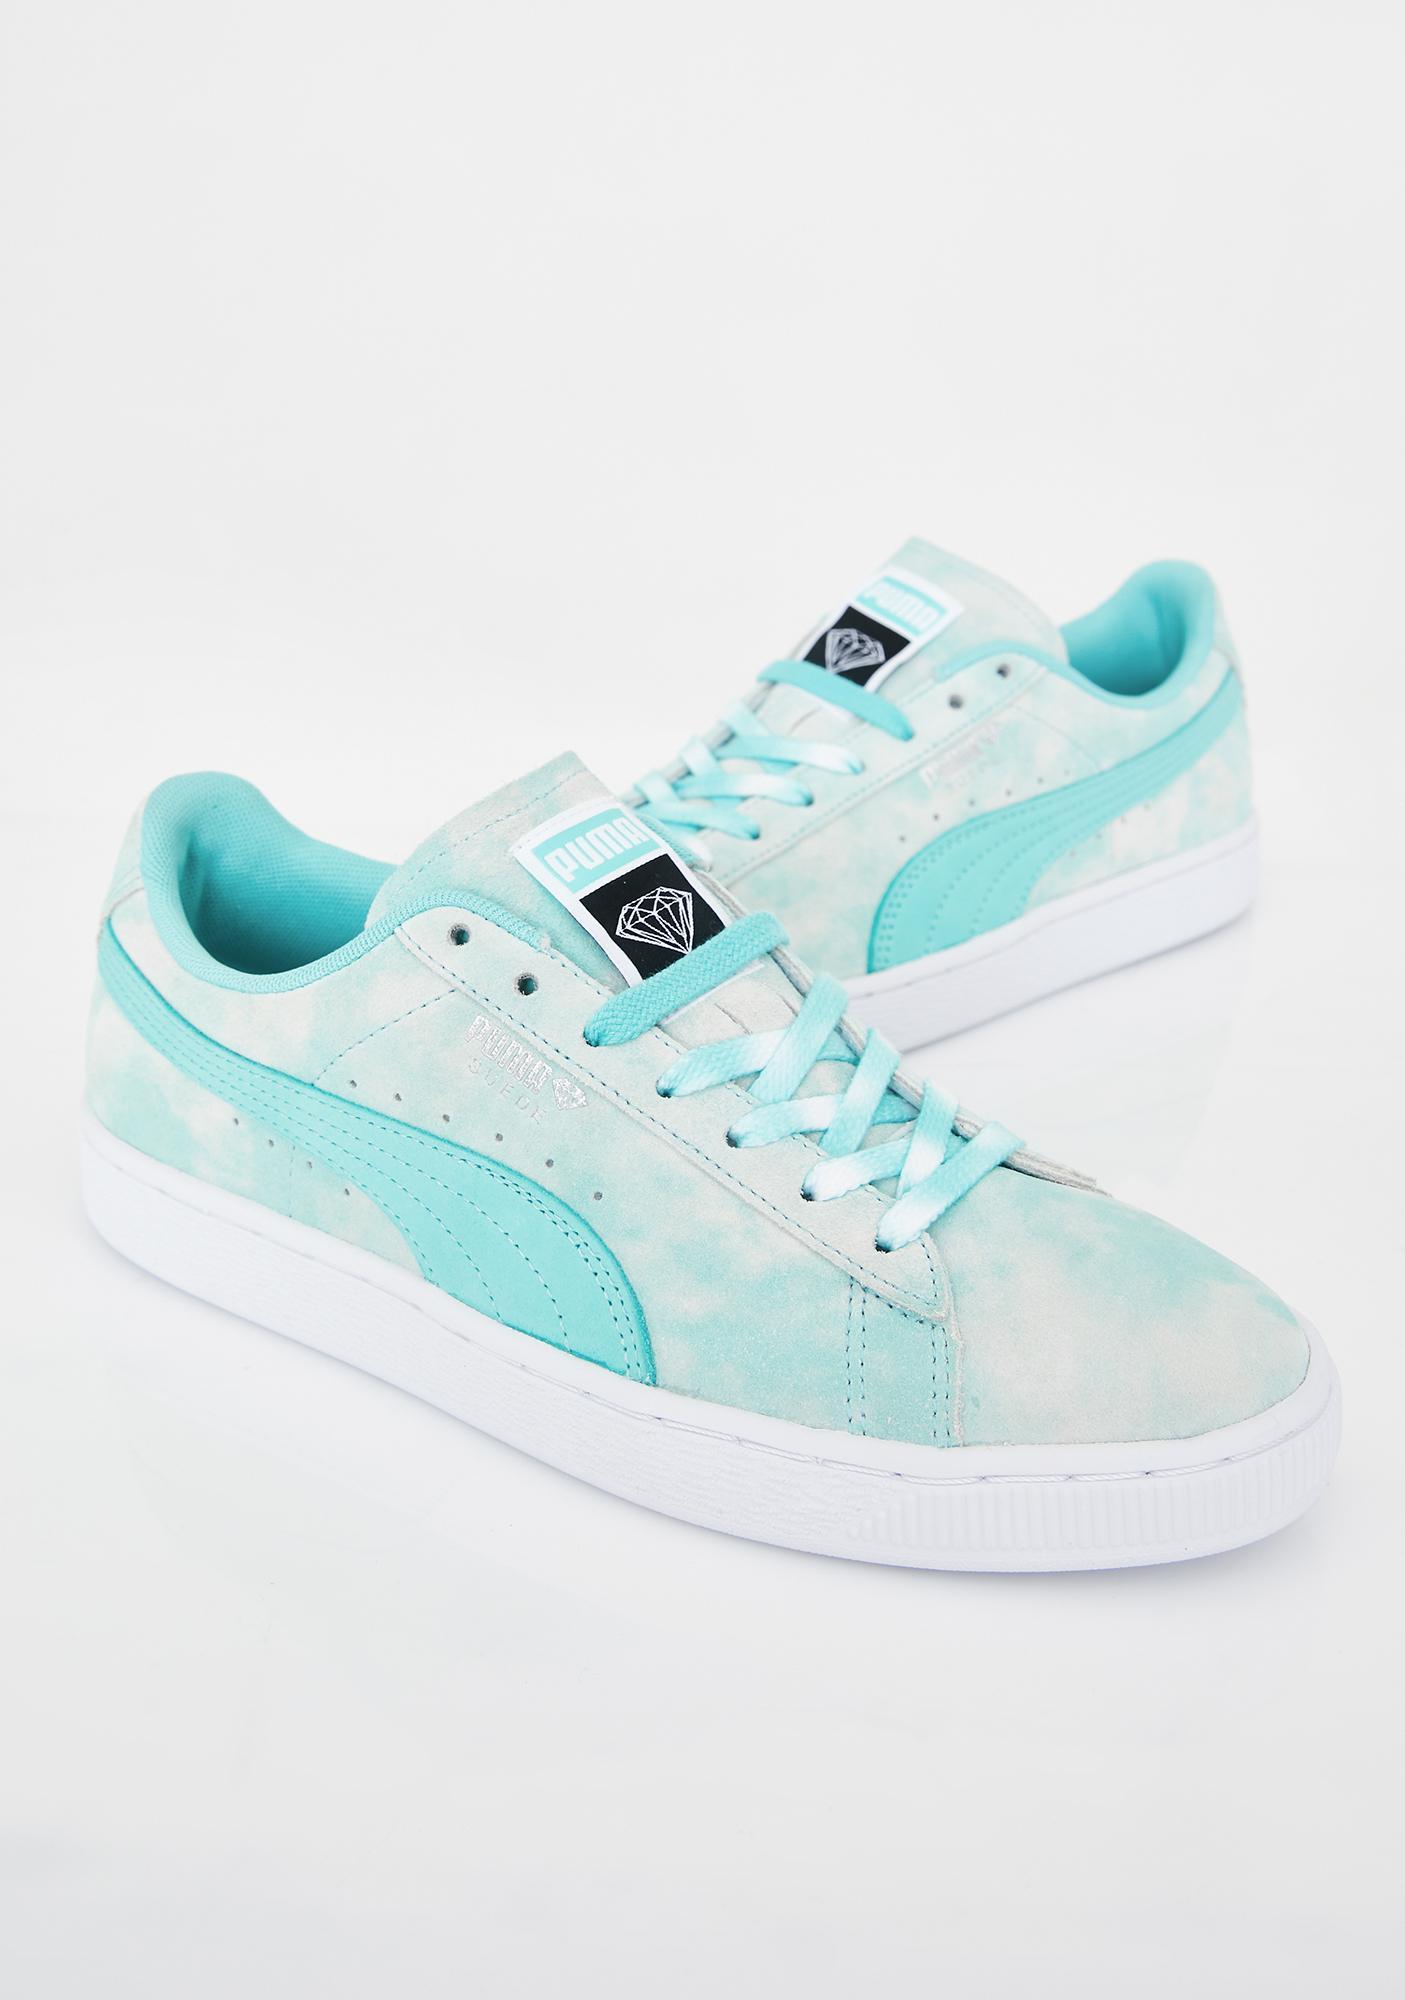 PUMA x Diamond Supply Co. Suede Sneakers